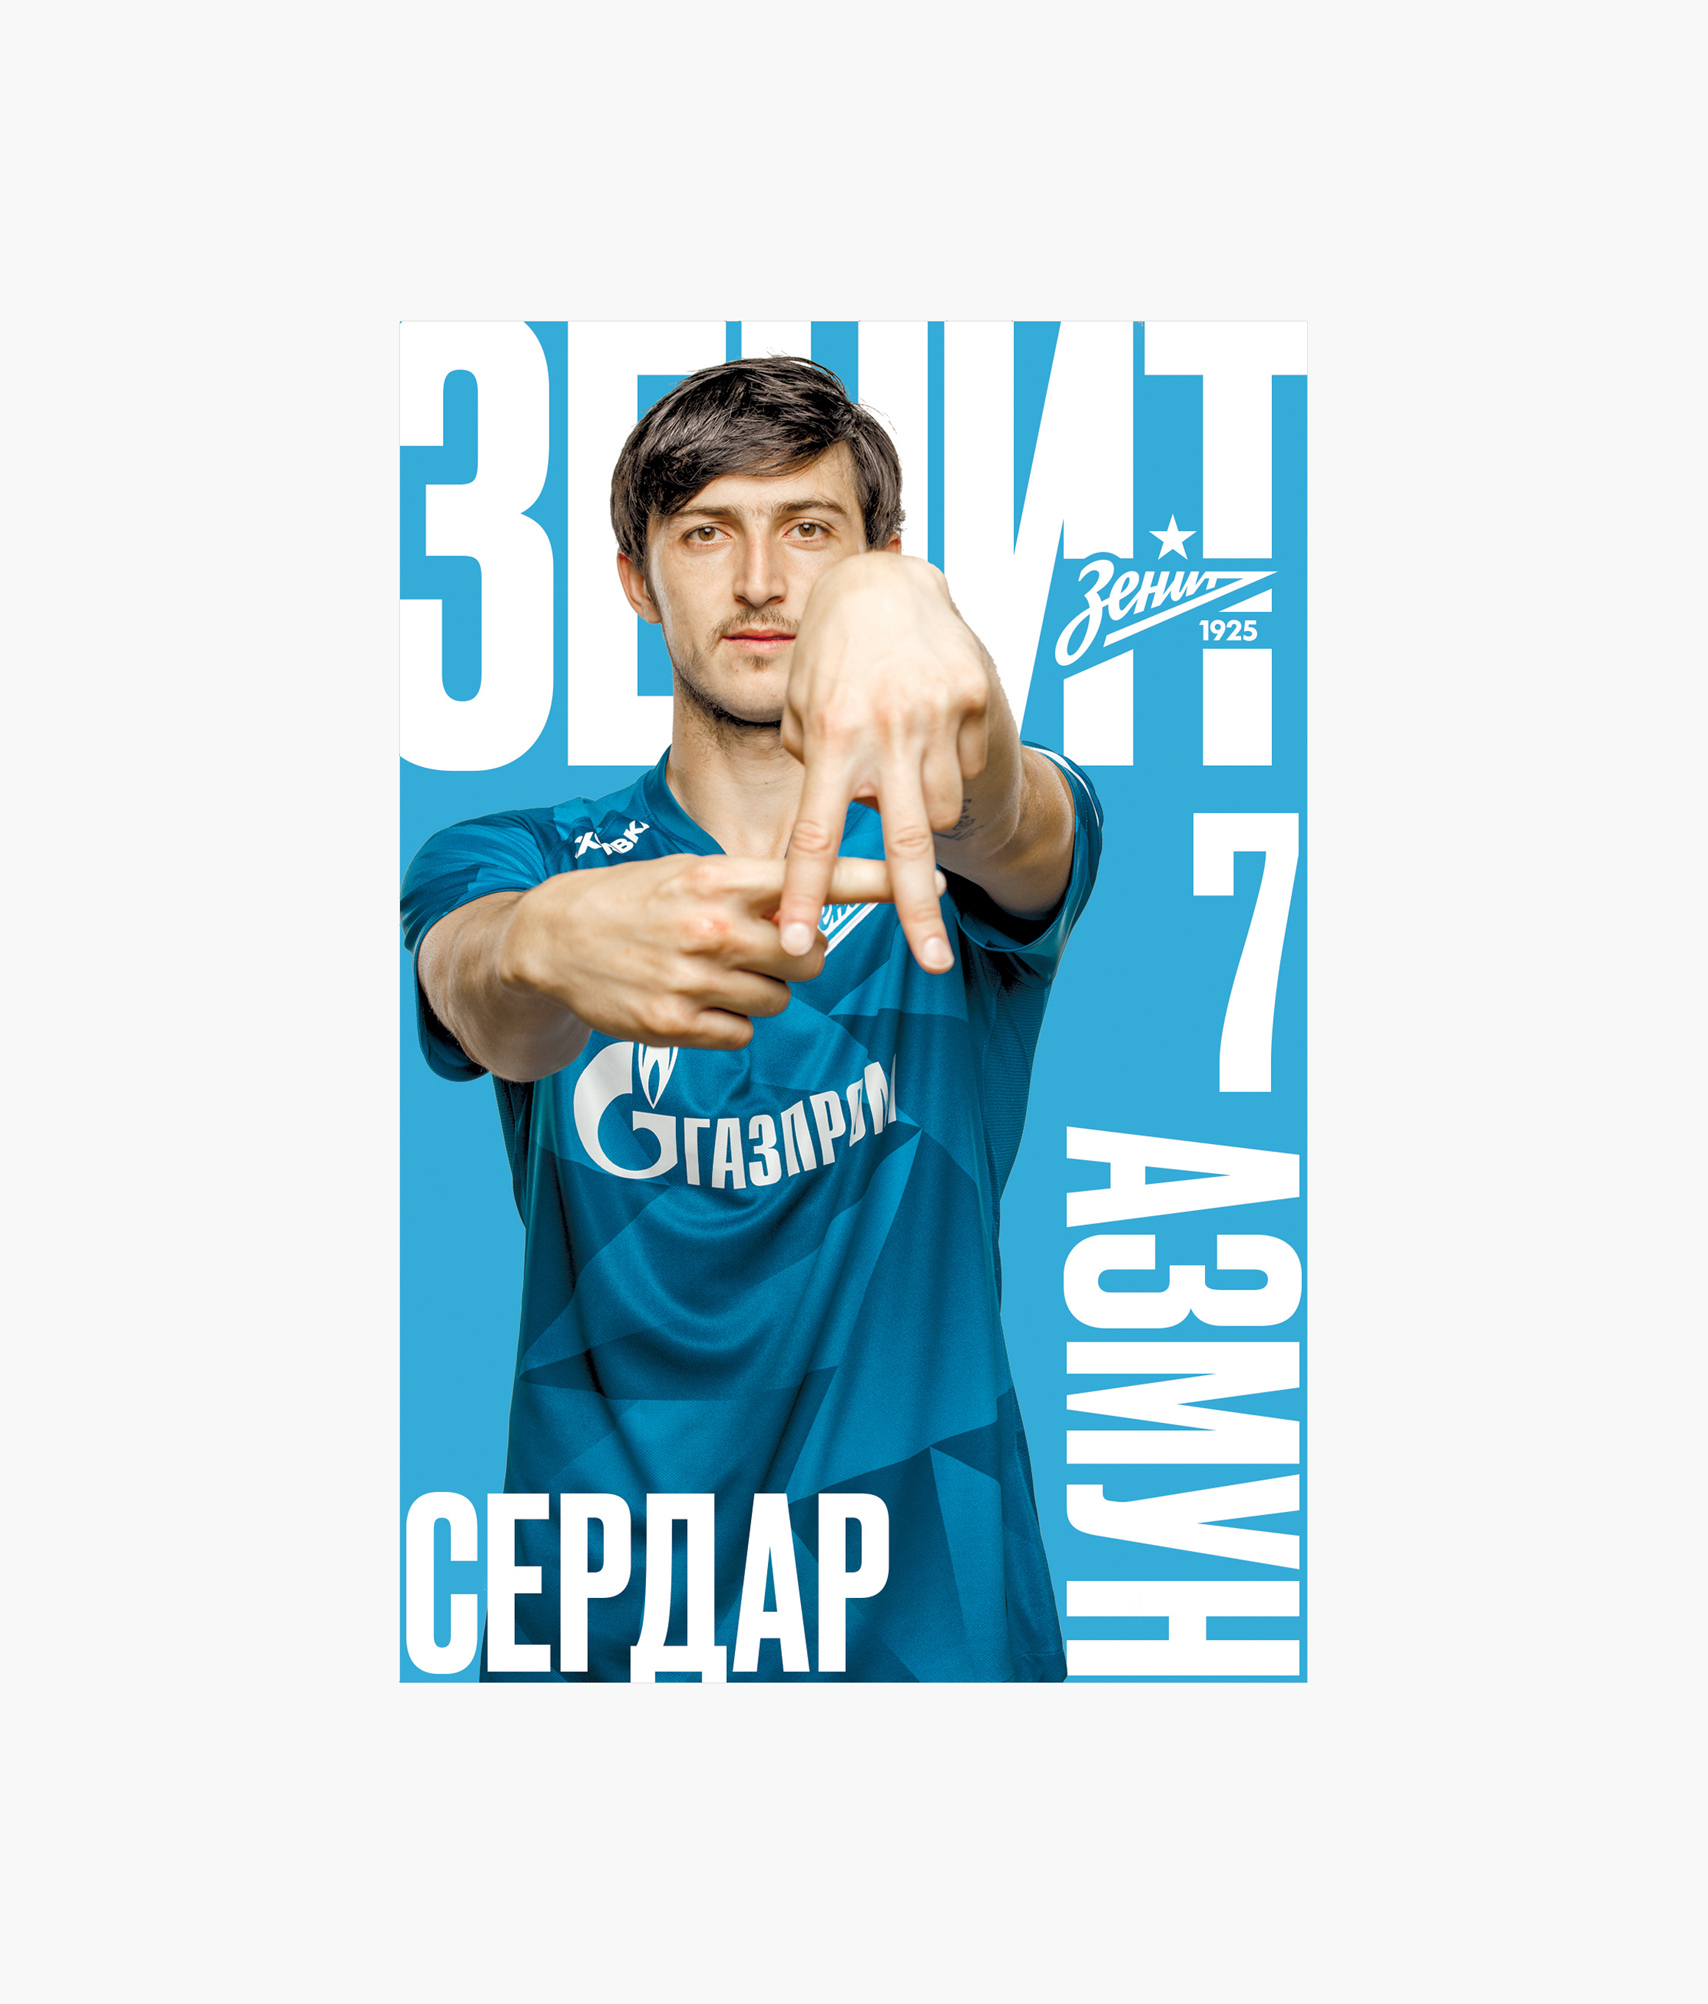 Открытка «Азмун 2019/2020» Зенит открытка лодыгин 2018 2019 зенит